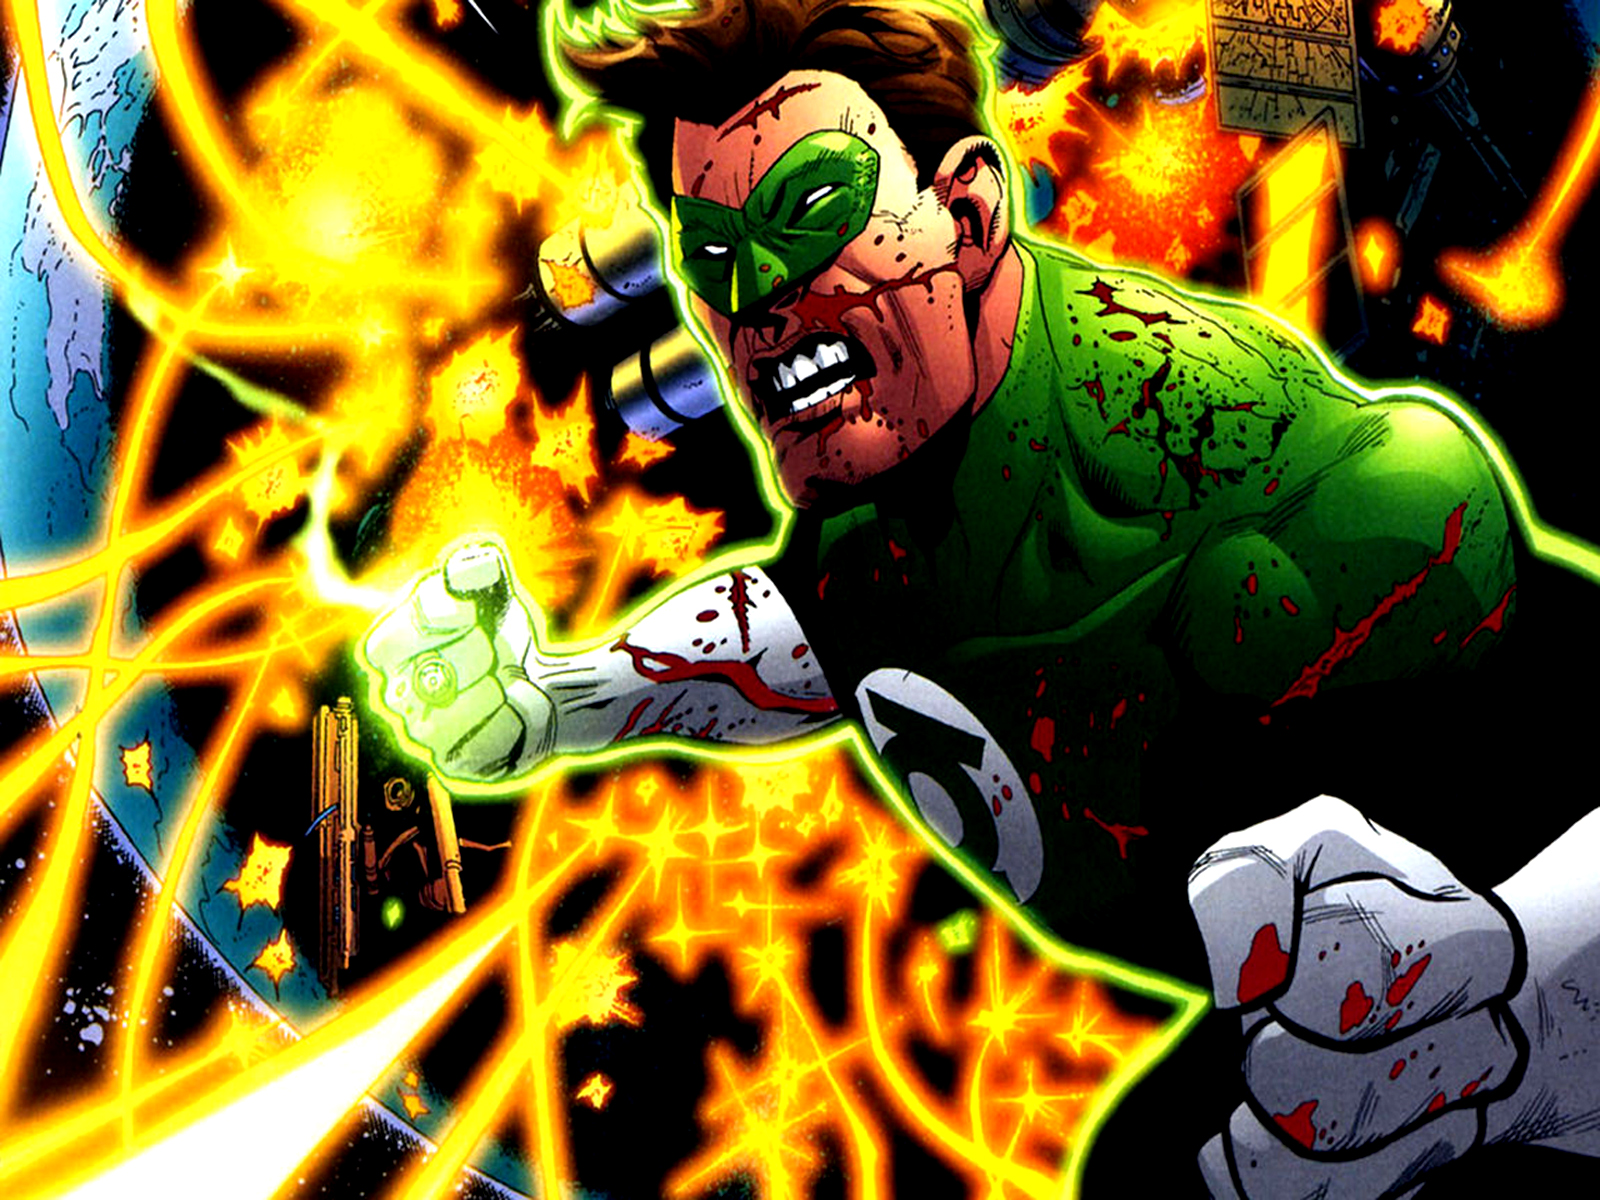 Green Lantern DC Comics HD Wallpaper | Desktop Wallpapers